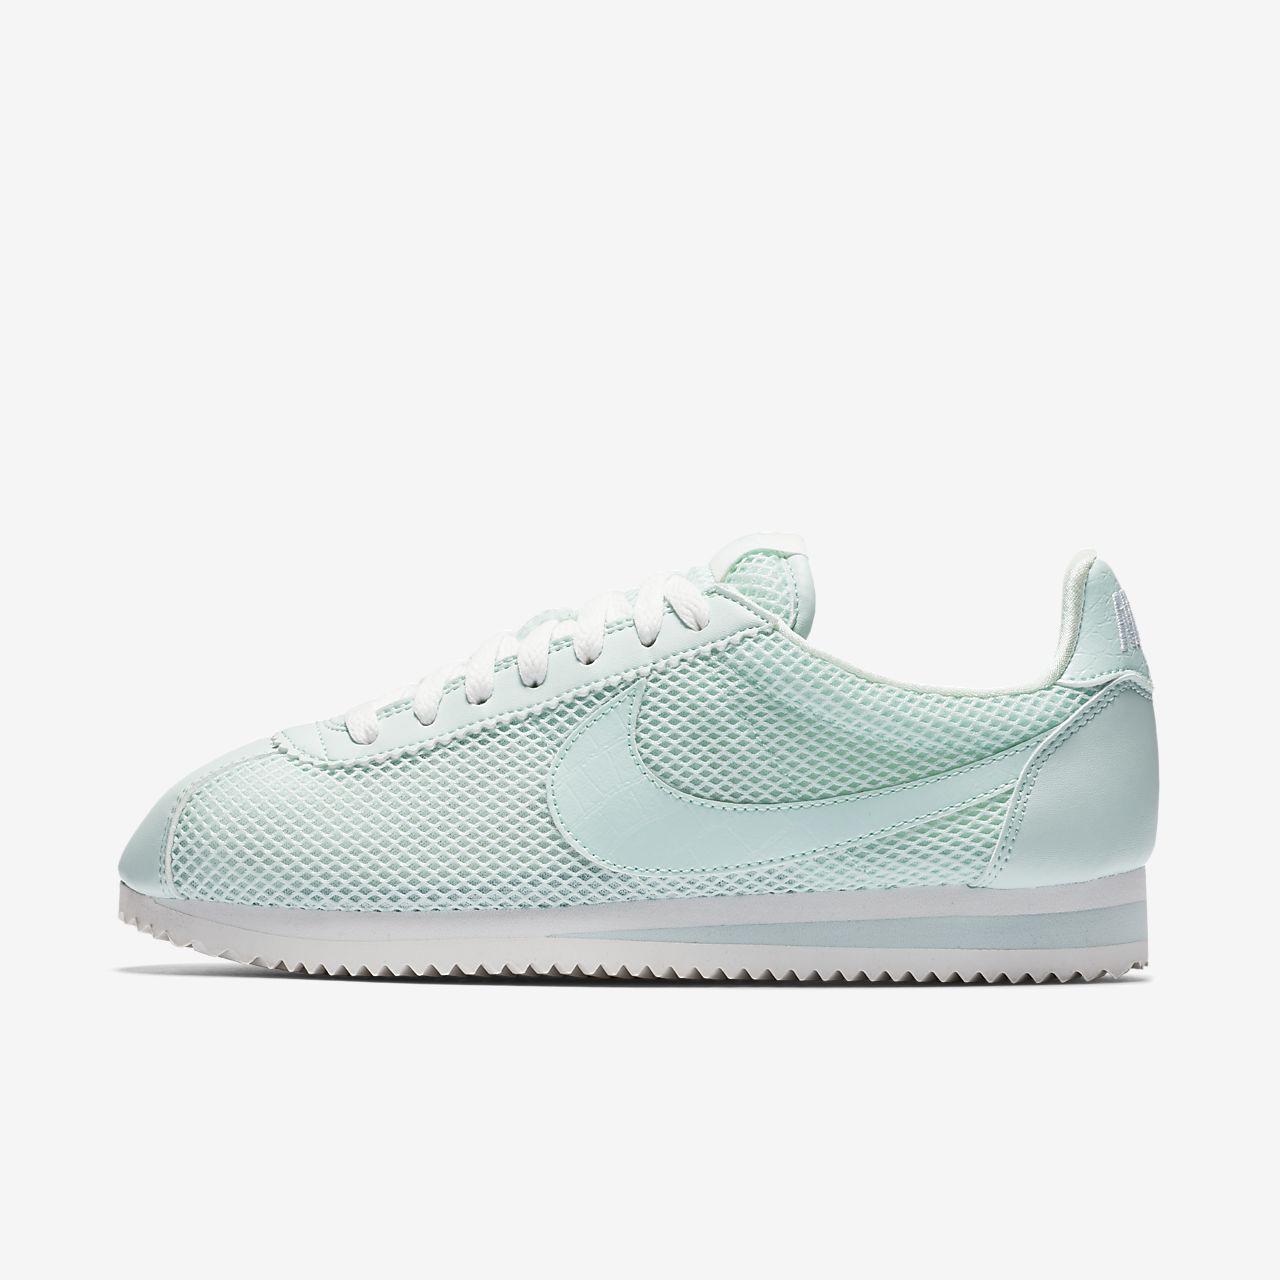 ... Nike Classic Cortez Premium Women's Shoe